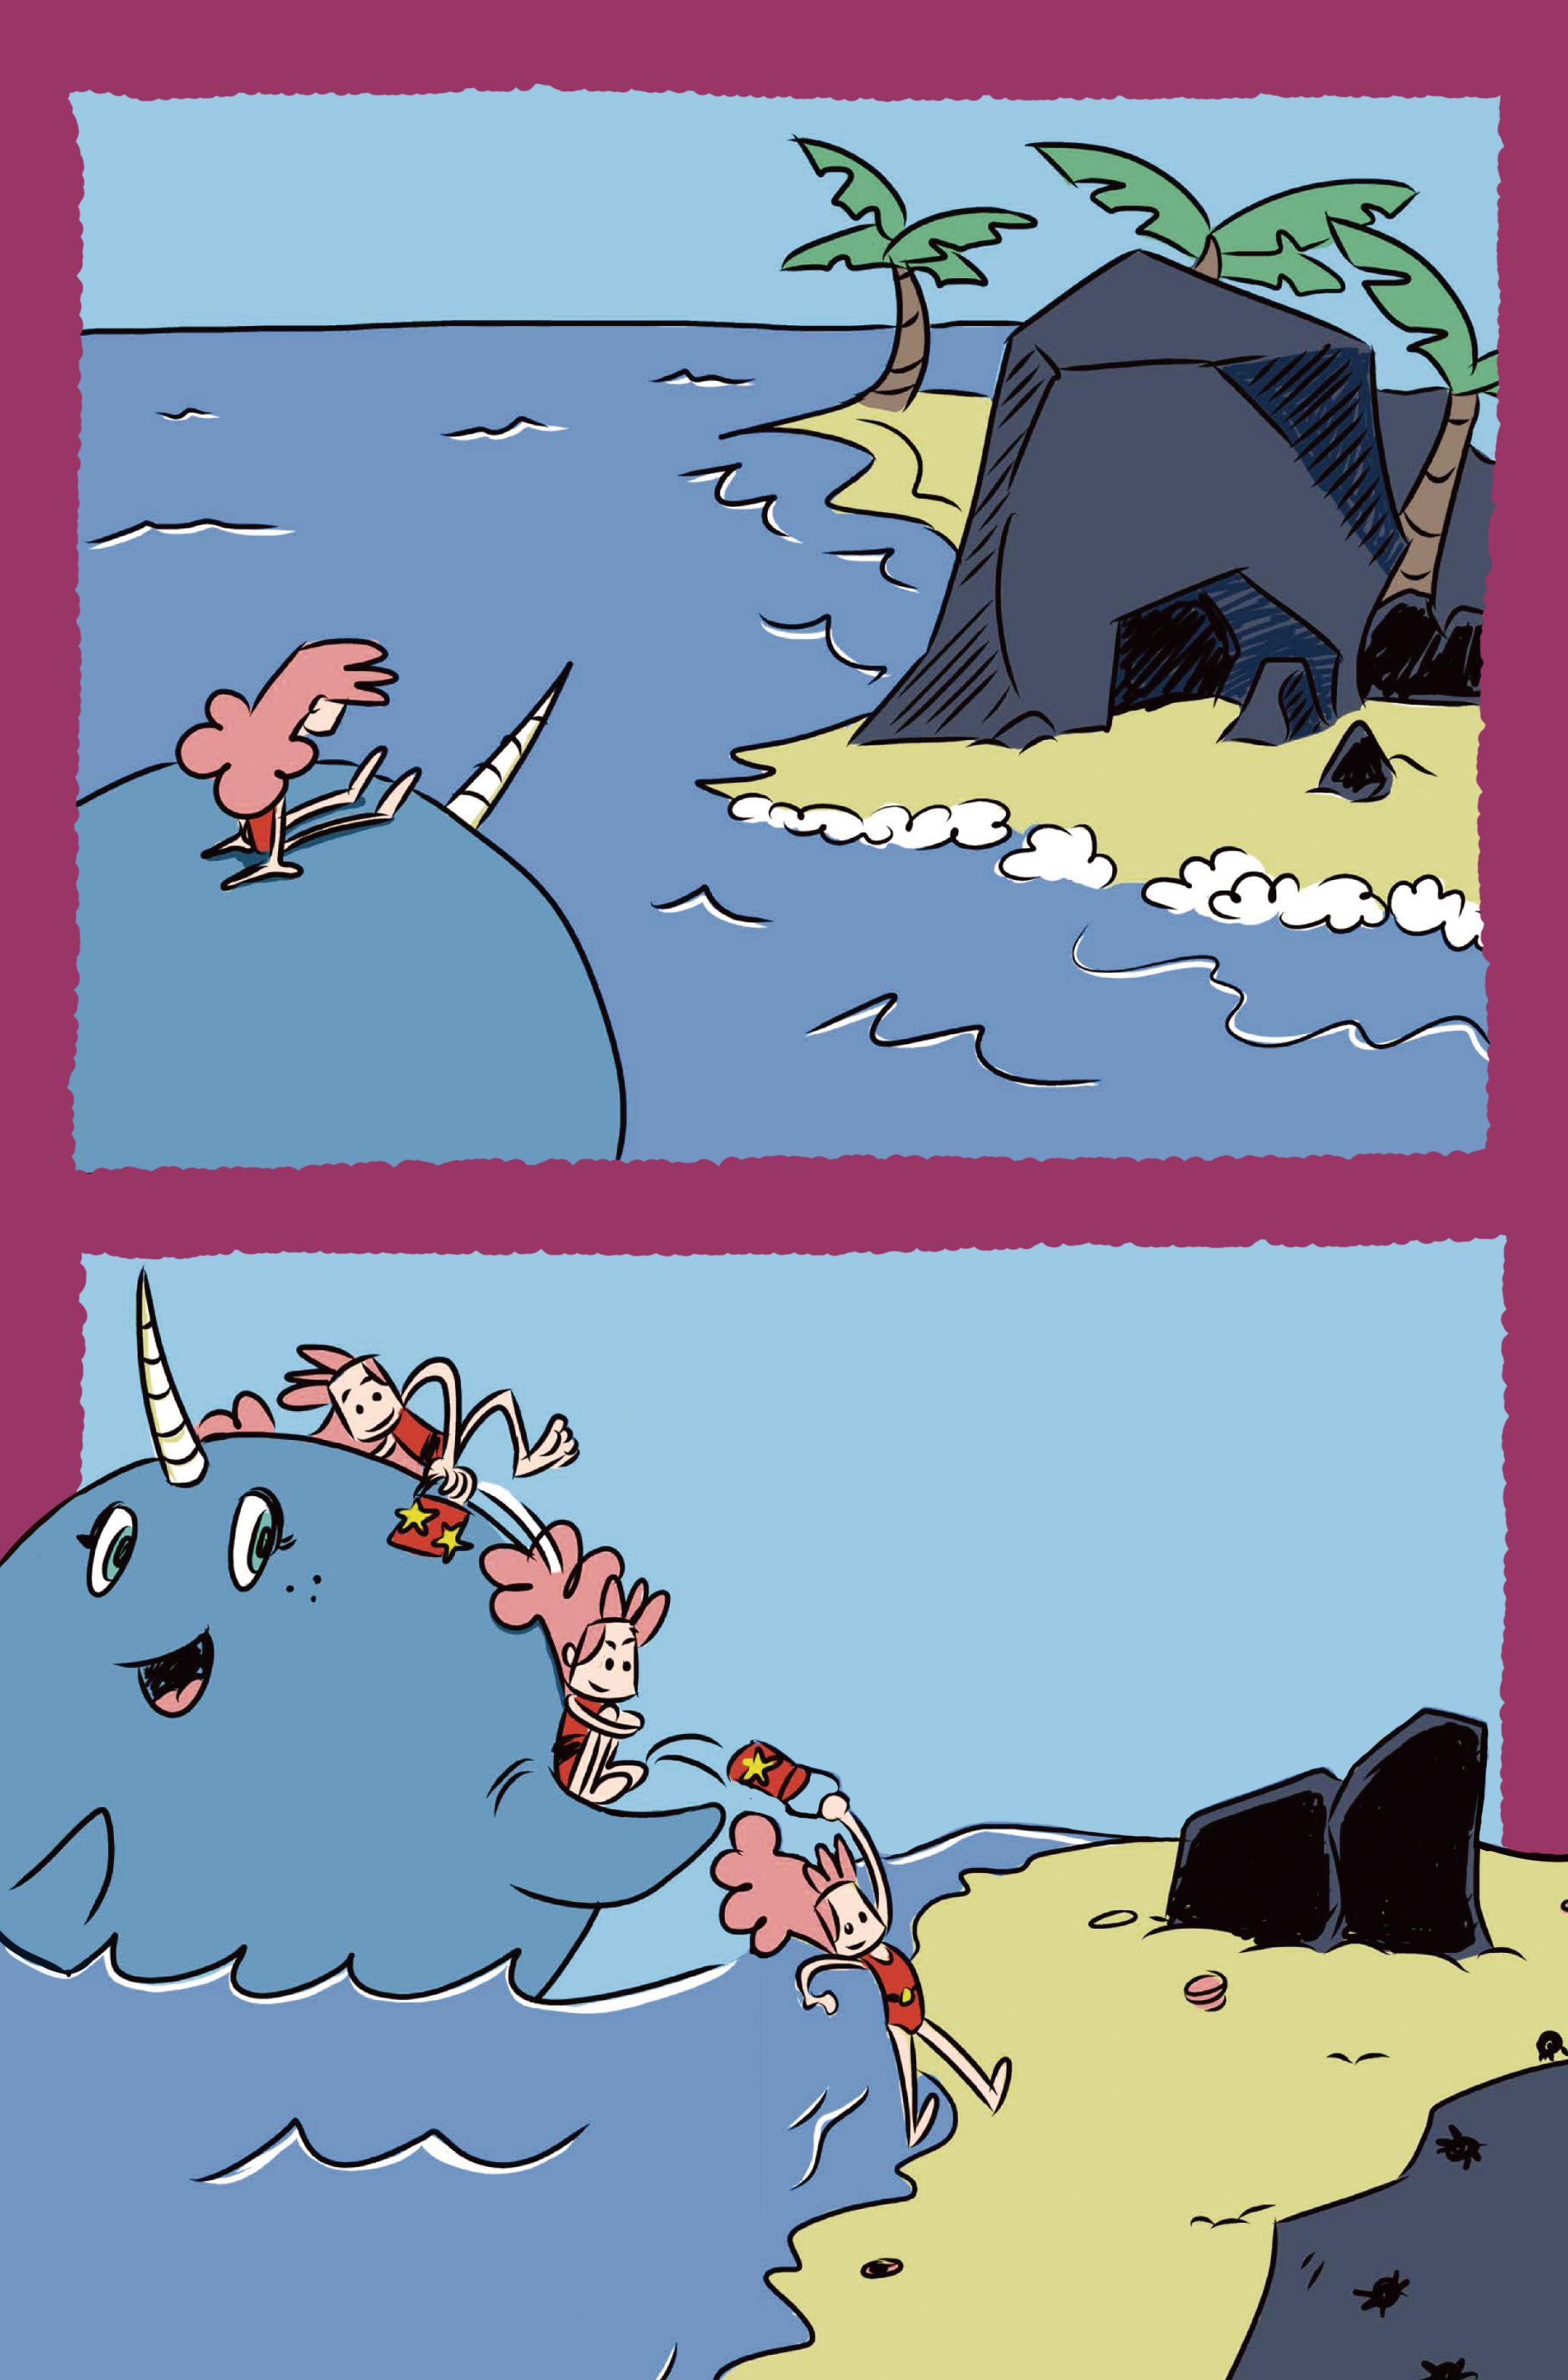 Seafoam A Friend for Madison #1 Page 1.jpg